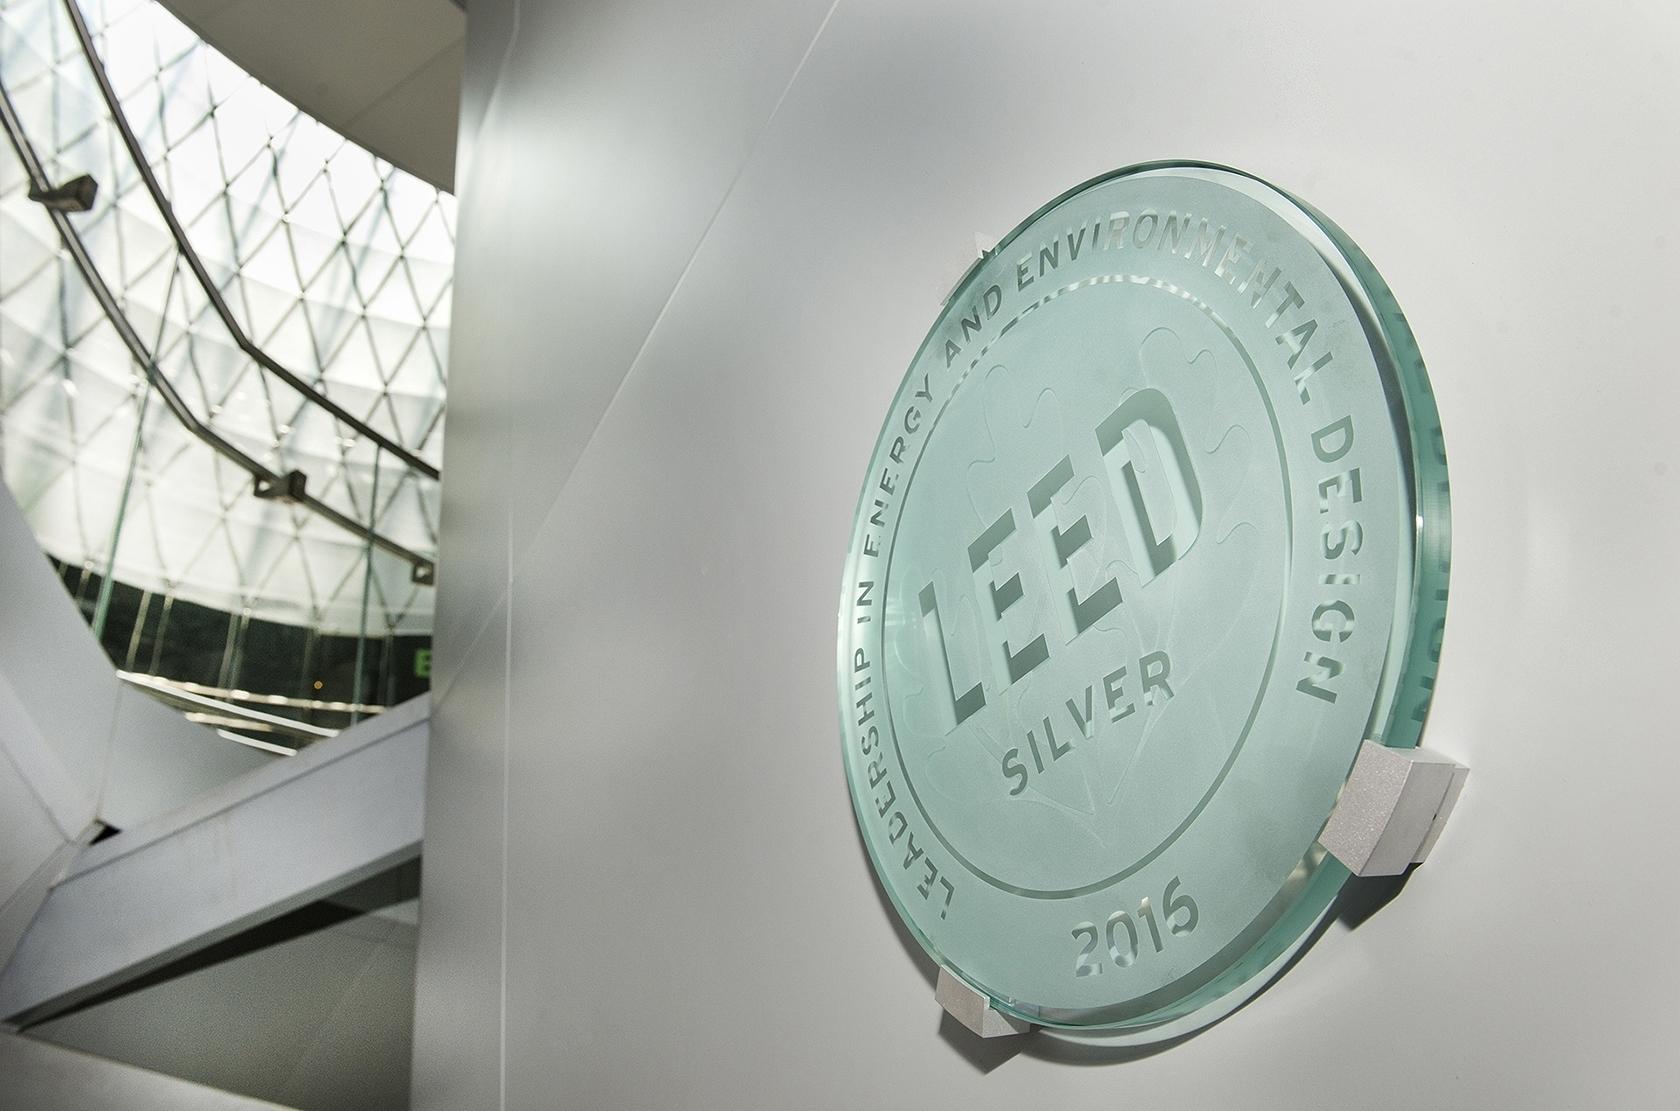 Fulton_Center_LEED_Certification Site-Ready.jpg